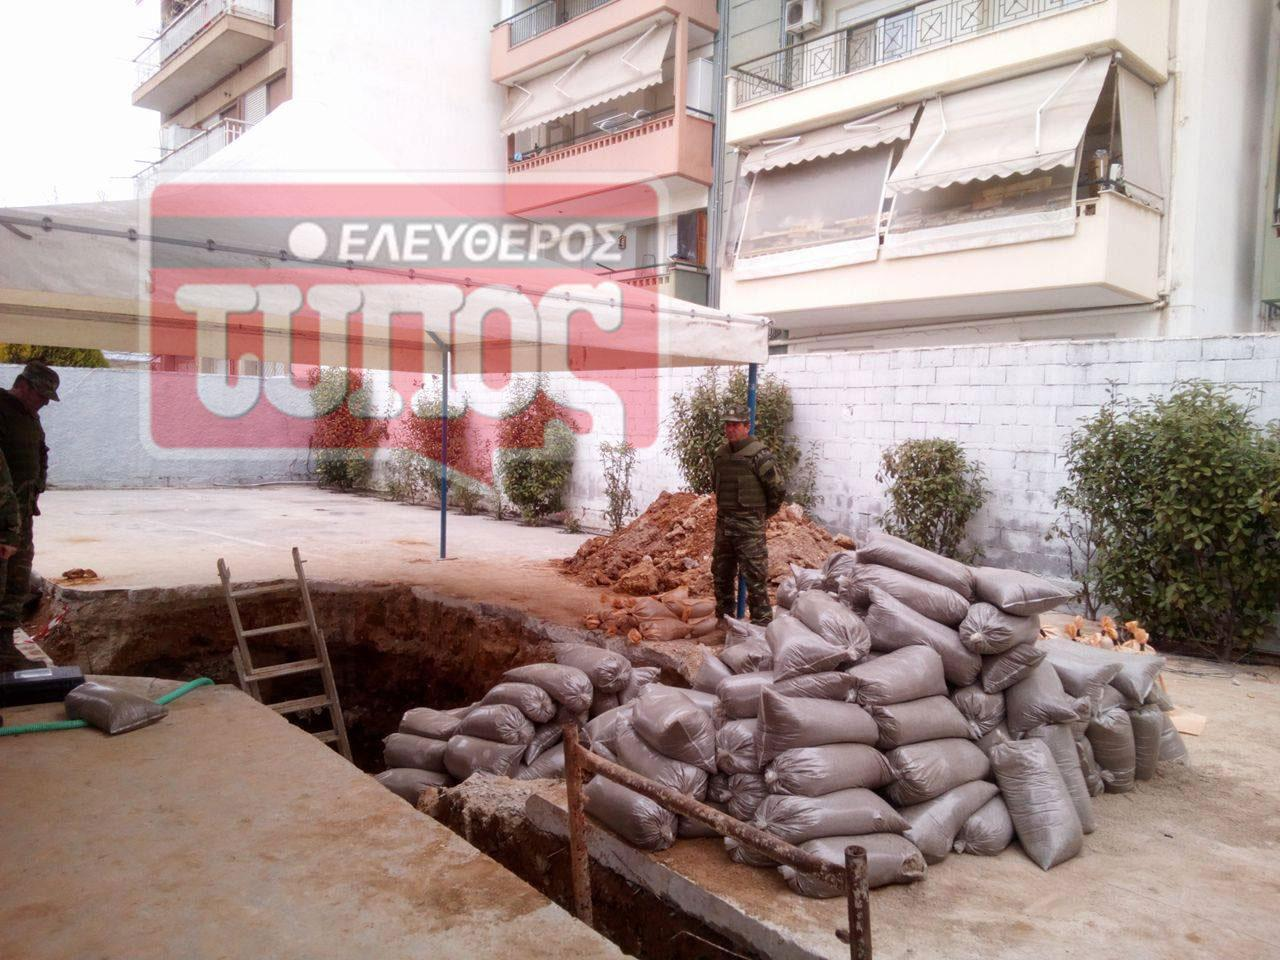 kordelio-purotexnourgoi Λήξη συναγερμού στο Κορδελιό - Επιστρέφουν οι κάτοικοι